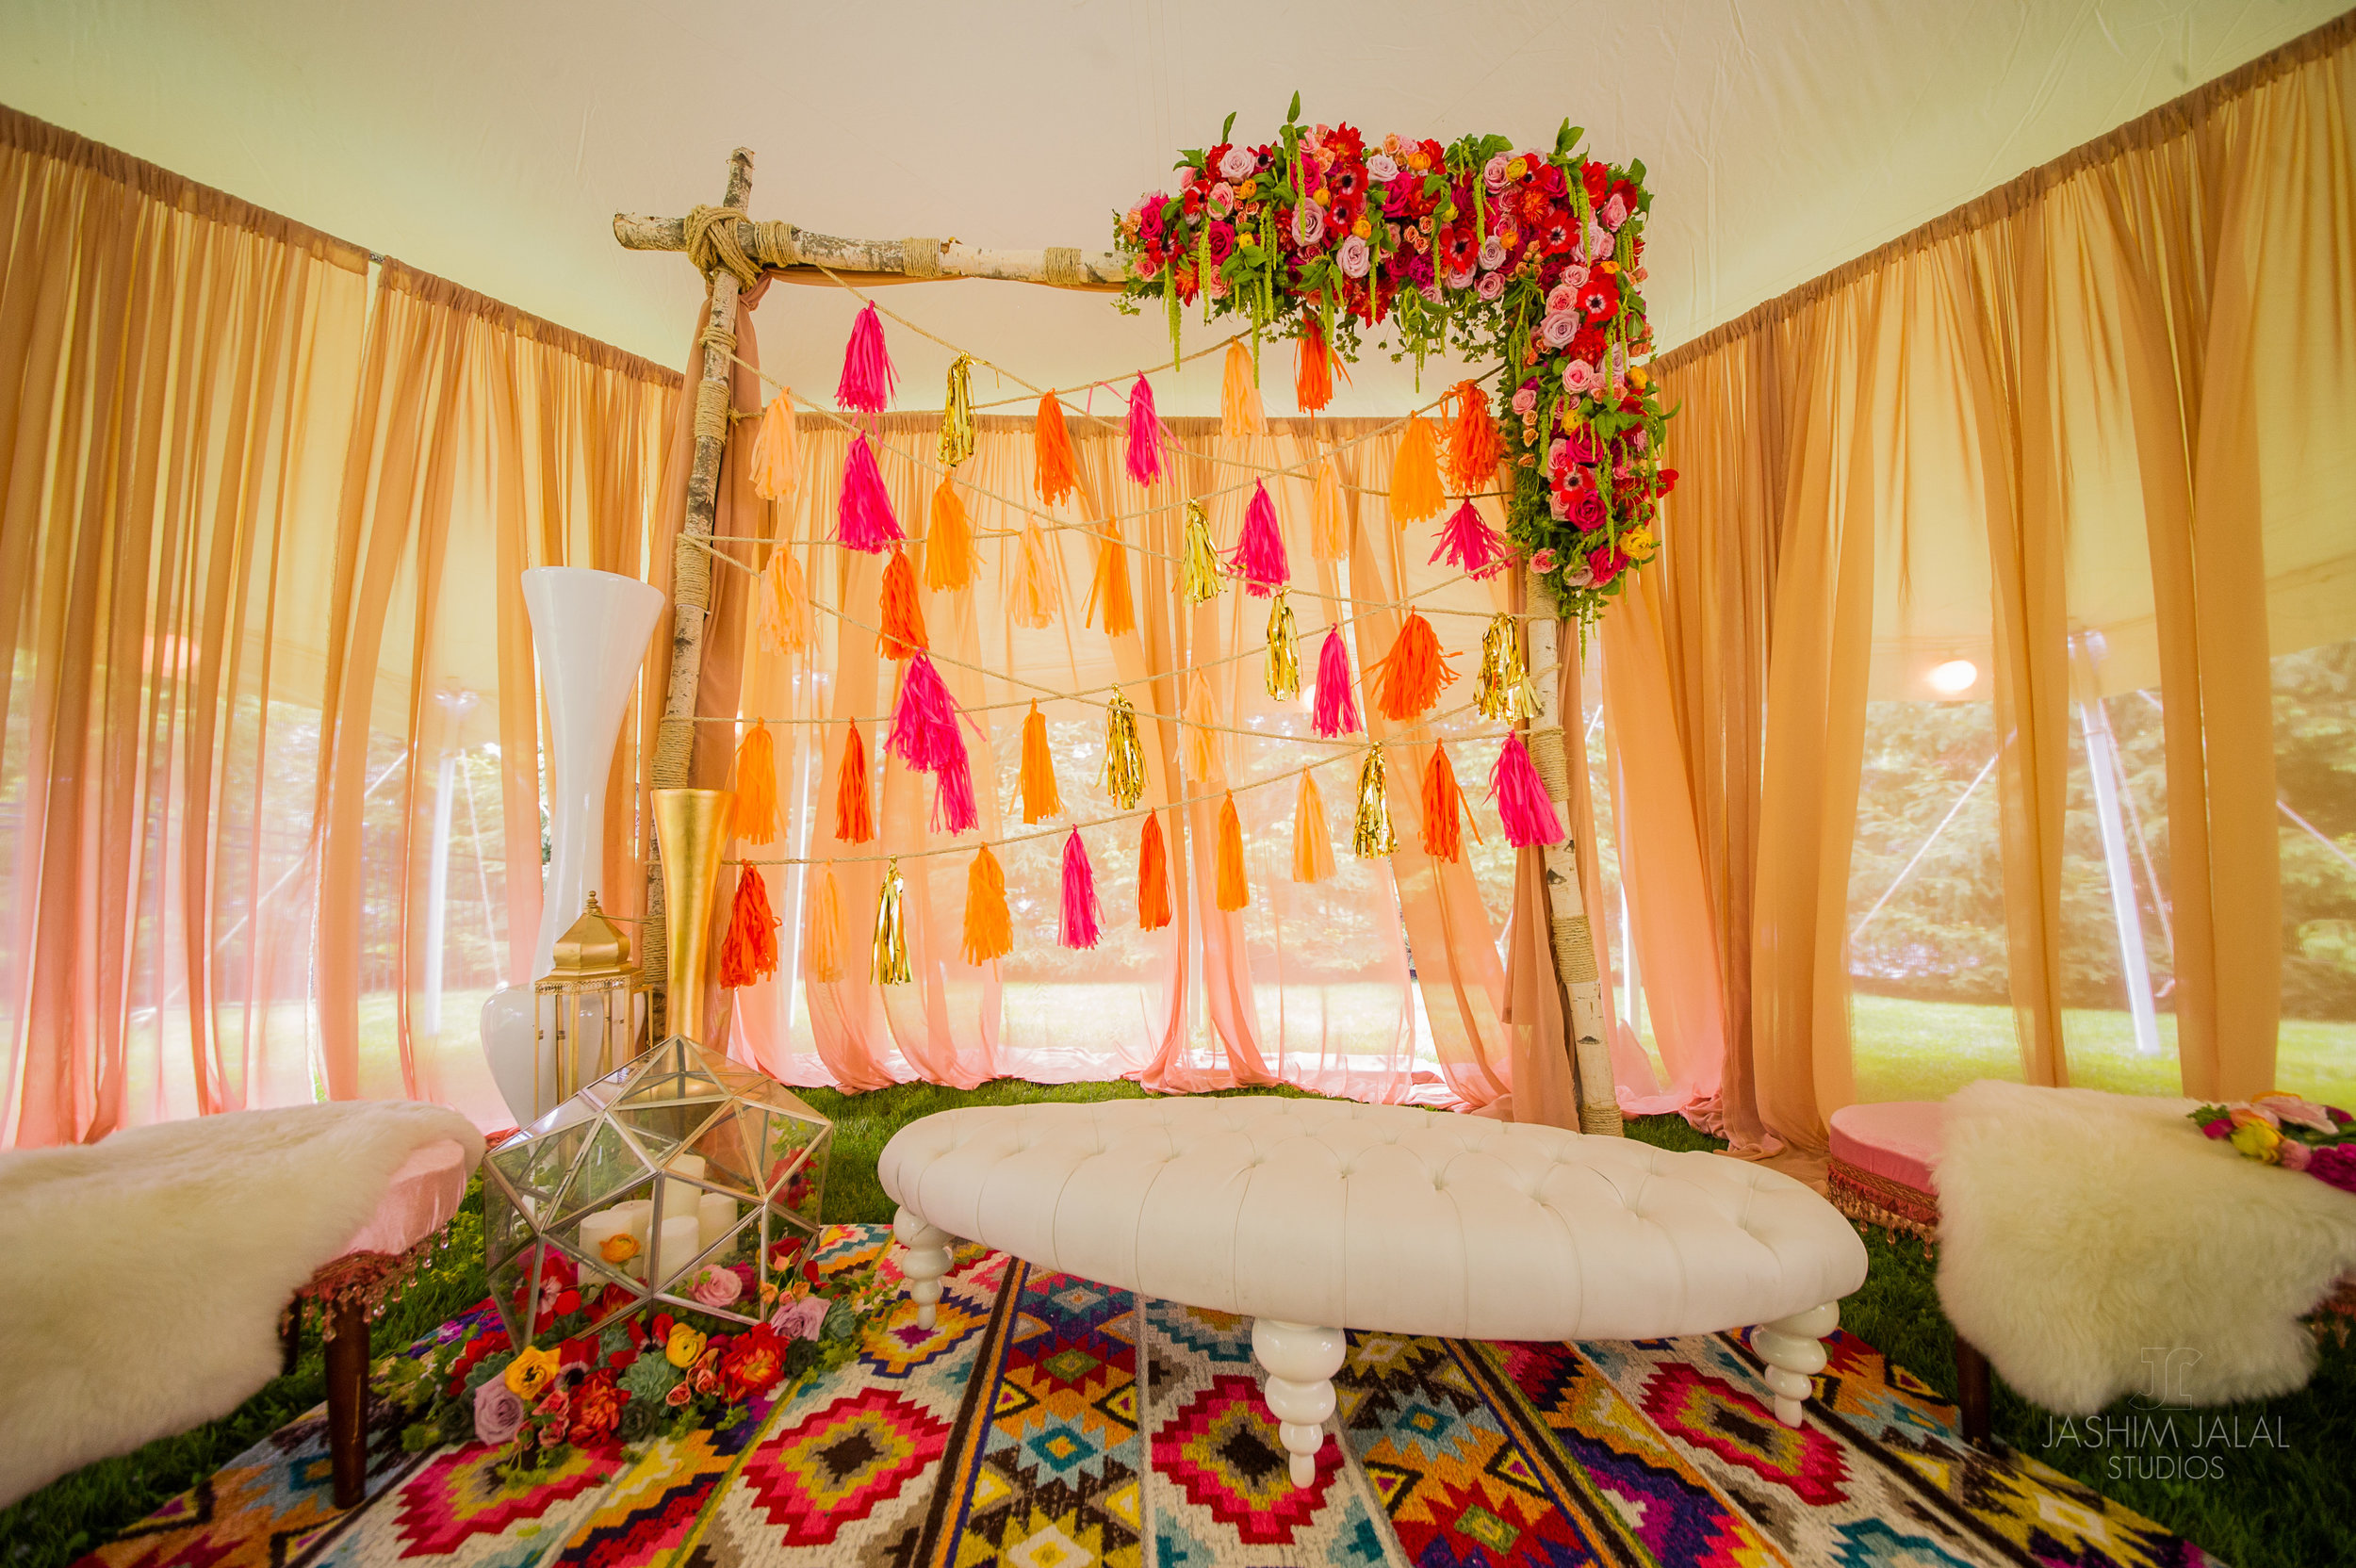 Indian Bridal Shower Boho Chic Summer Tent Event with Dancer (24).JPG